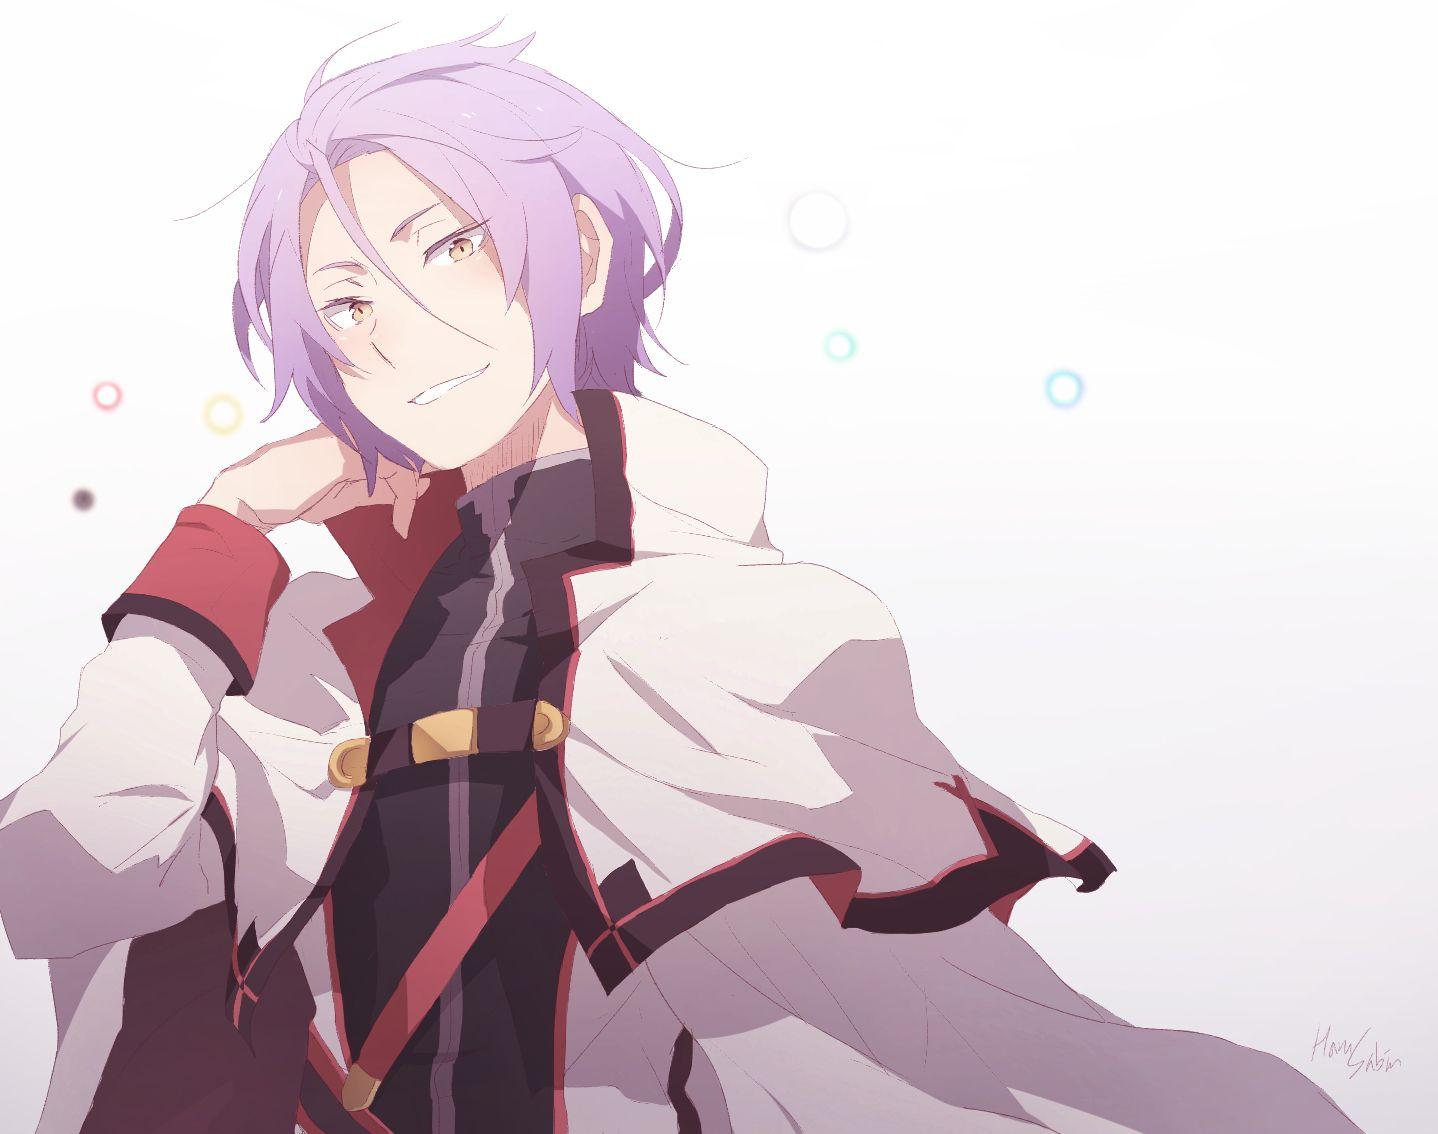 Julius Euclius from Re:Zero Kara Hajimeru Isekai 😍😍😍 ️ ️ ️ ...